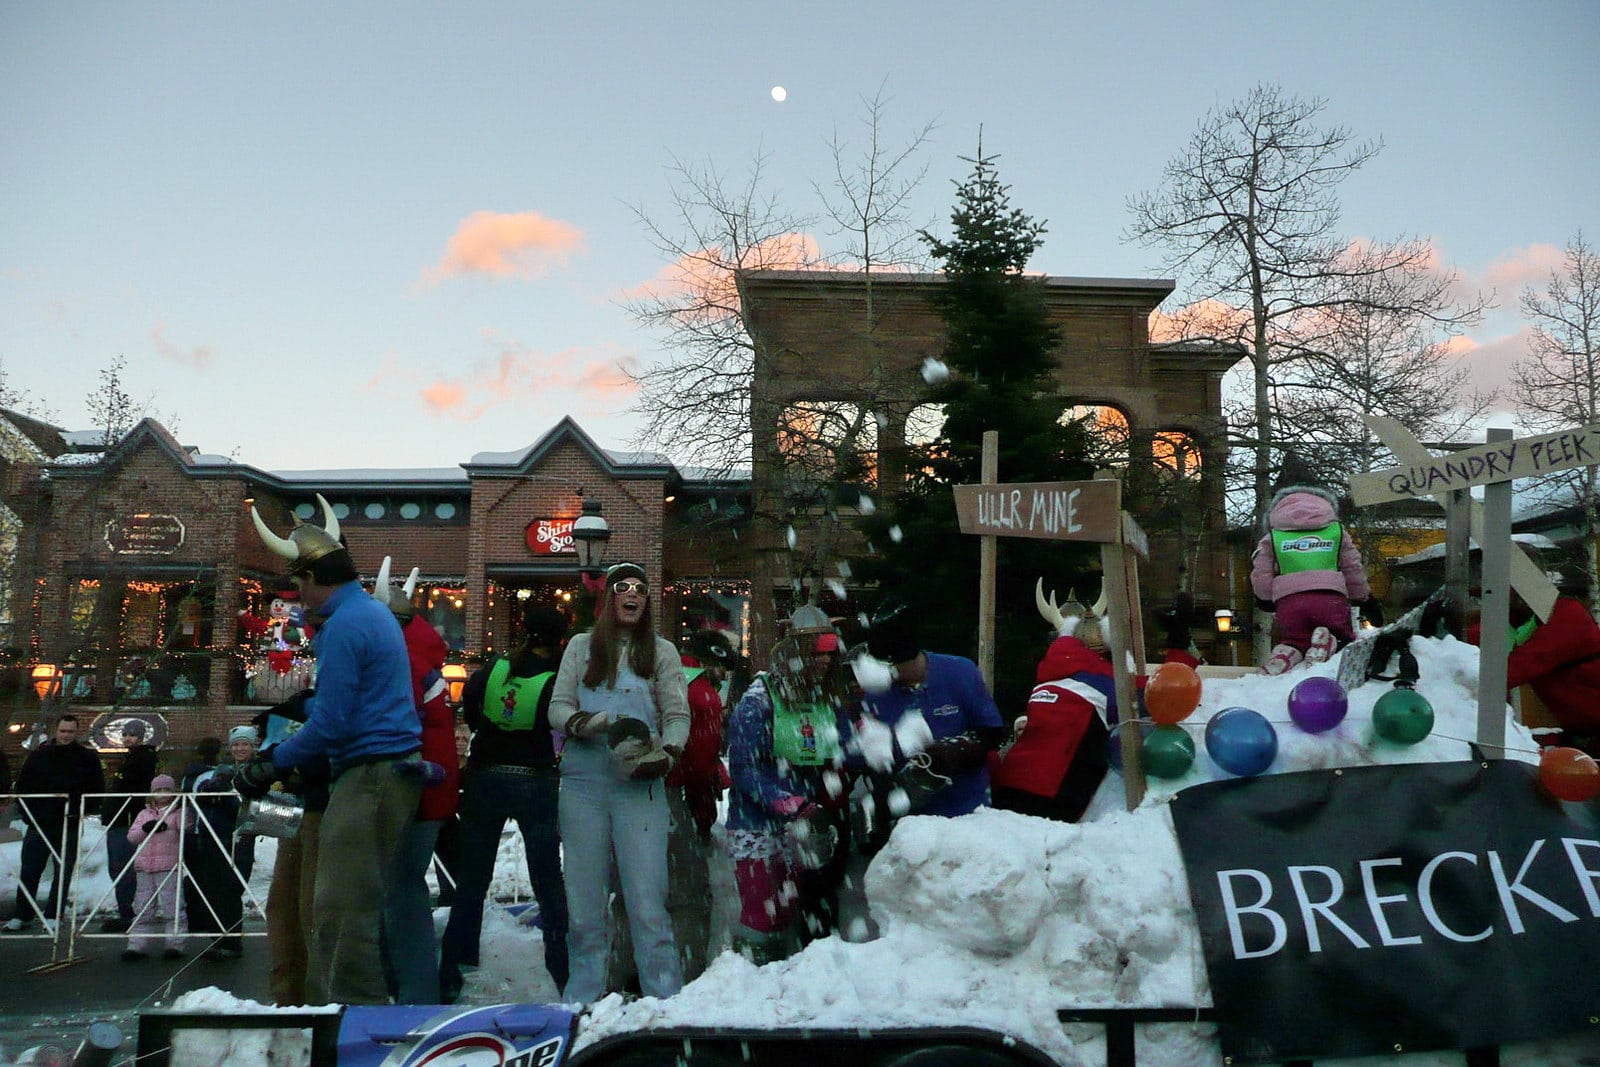 Image of the Breckenridge Ullr Festival Parade in Colorado